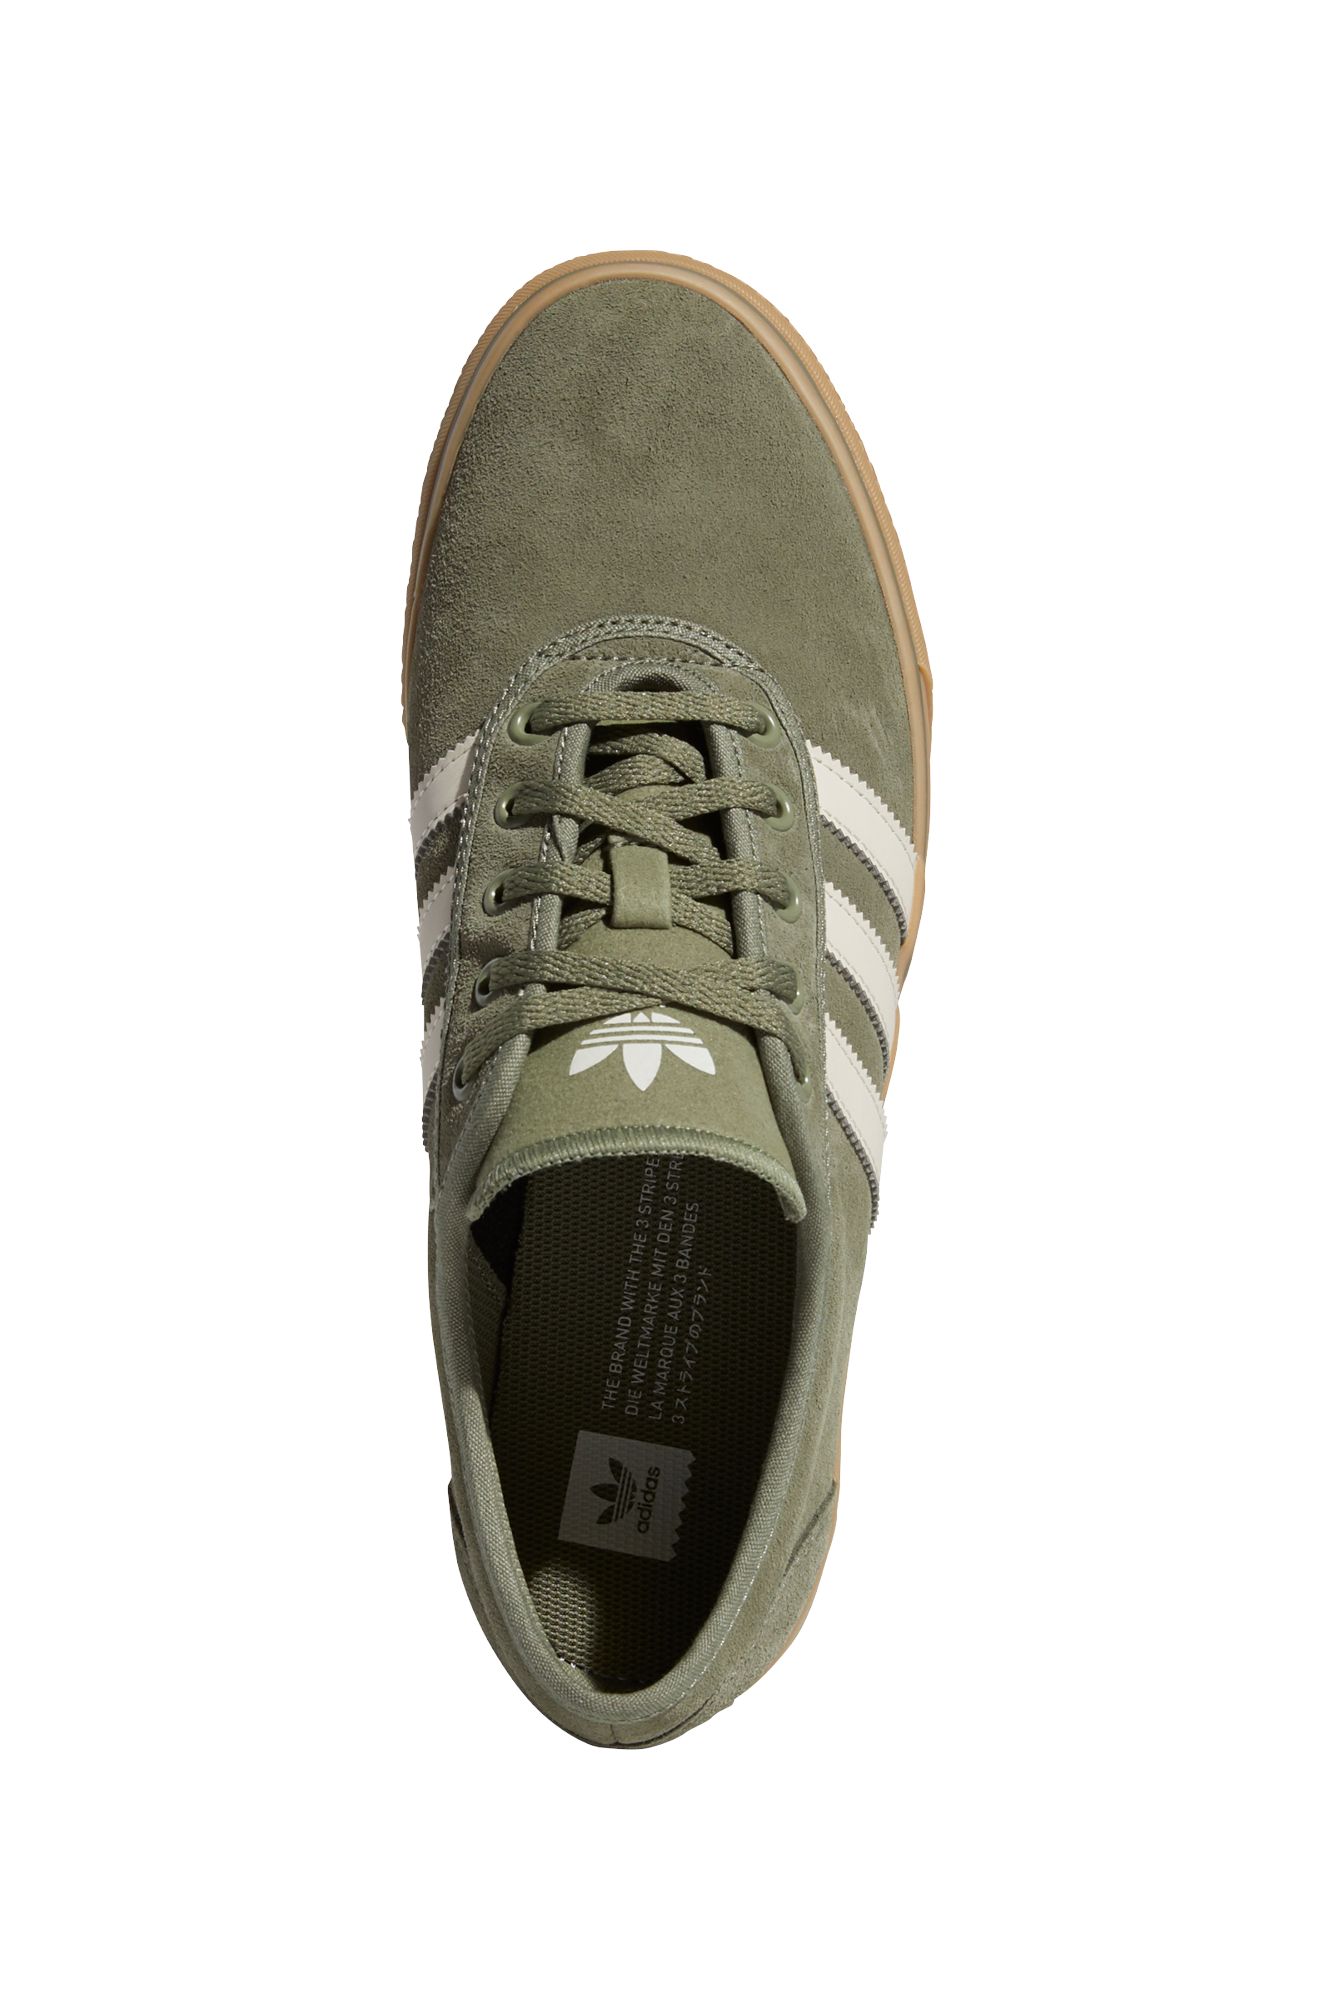 Adidas, Buty m?skie, Adi Ease, rozmiar 45 13